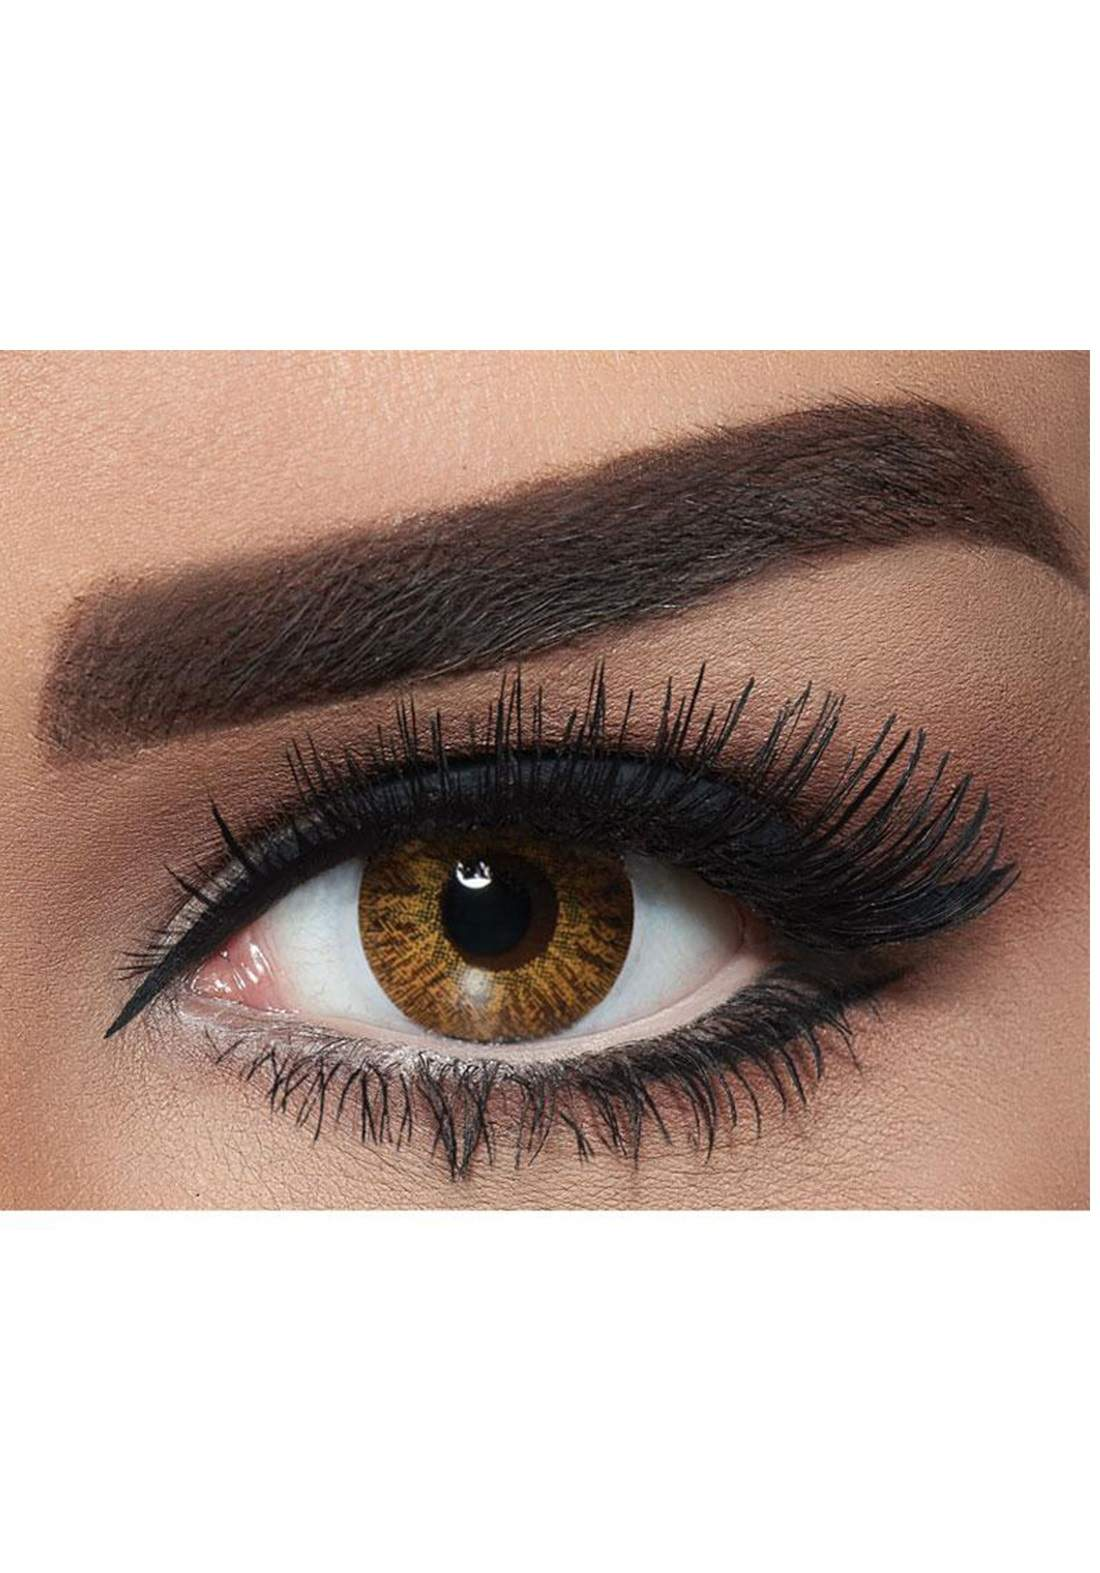 Bella Classic 301024 Contact Lenses 3 Months Use Natural - Hazel No.25 عدسات لاصقة